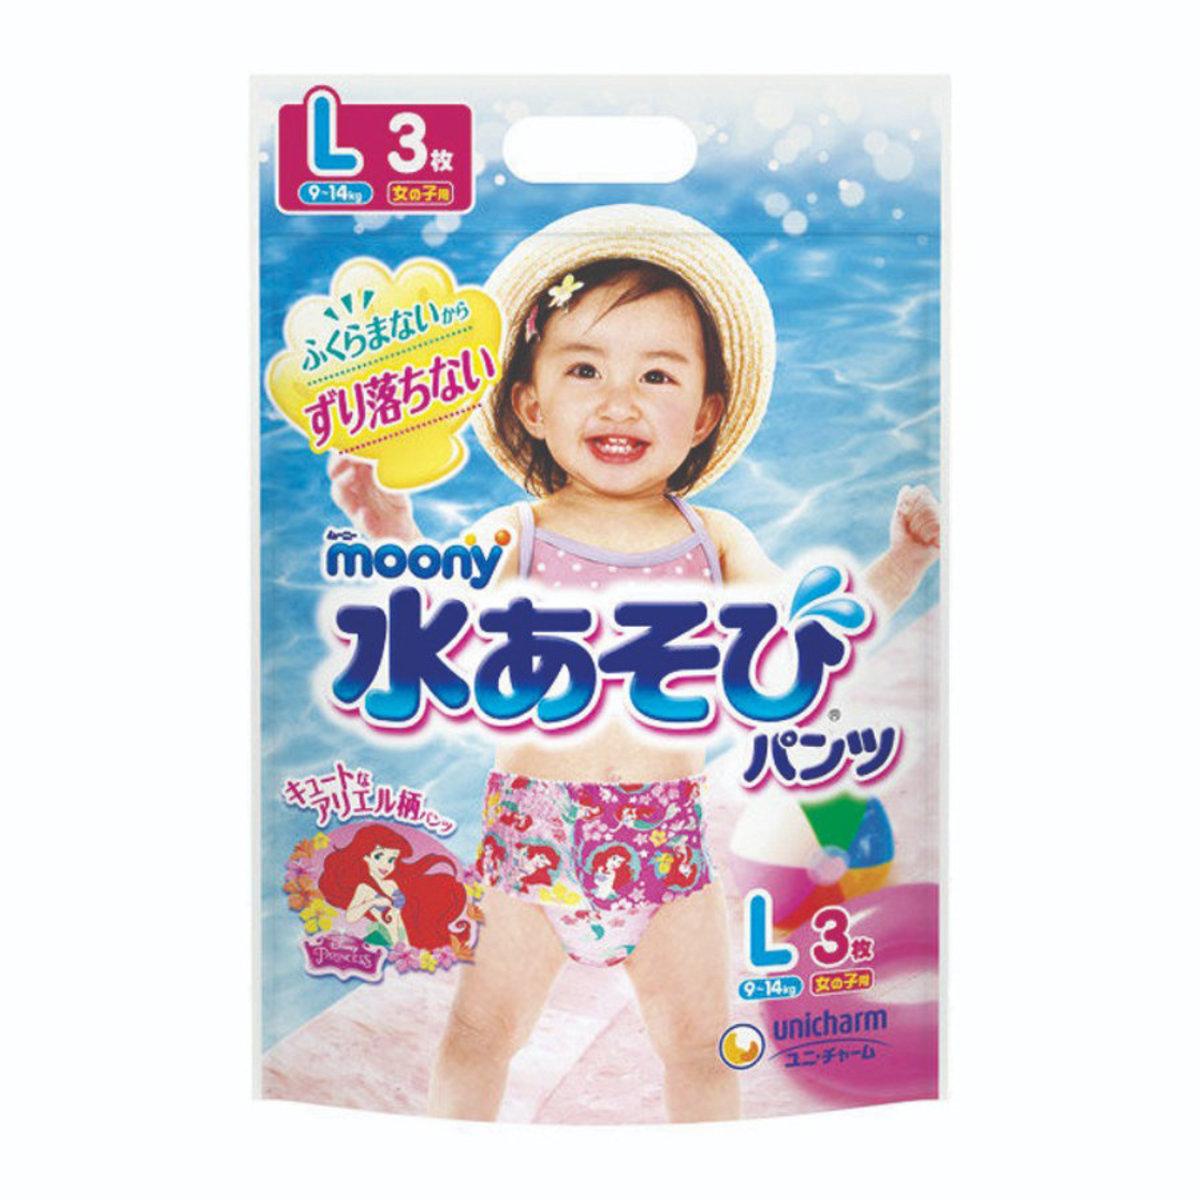 MOONY 游泳專用學習褲 x 3片入 (女童L) (4903111259588)